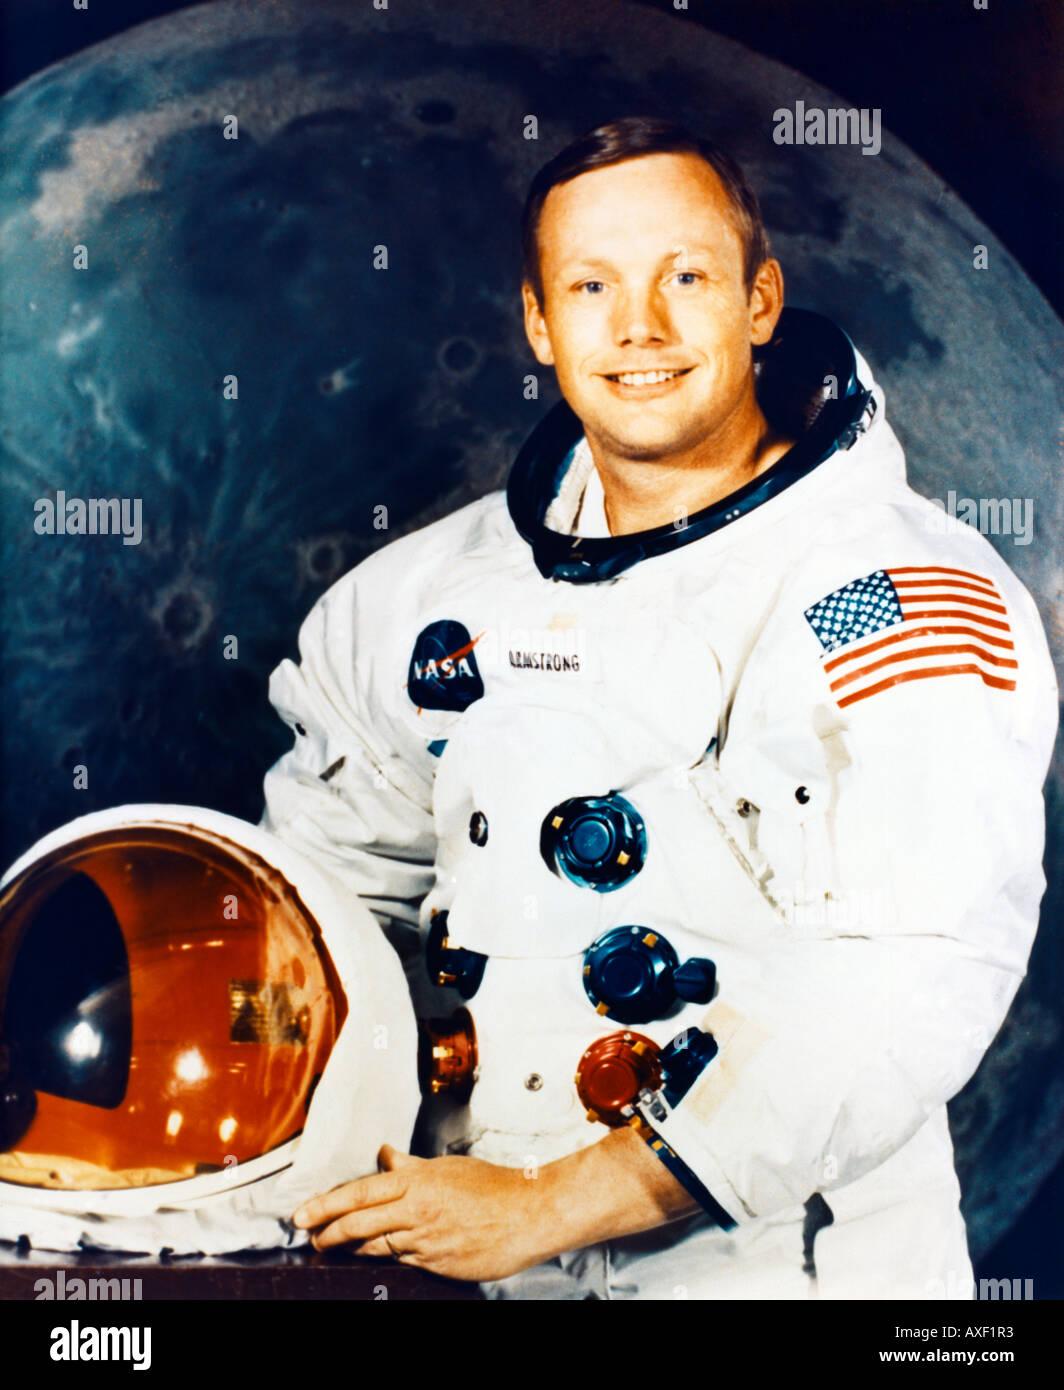 Neil Armstrong Astronaut Stock Photo